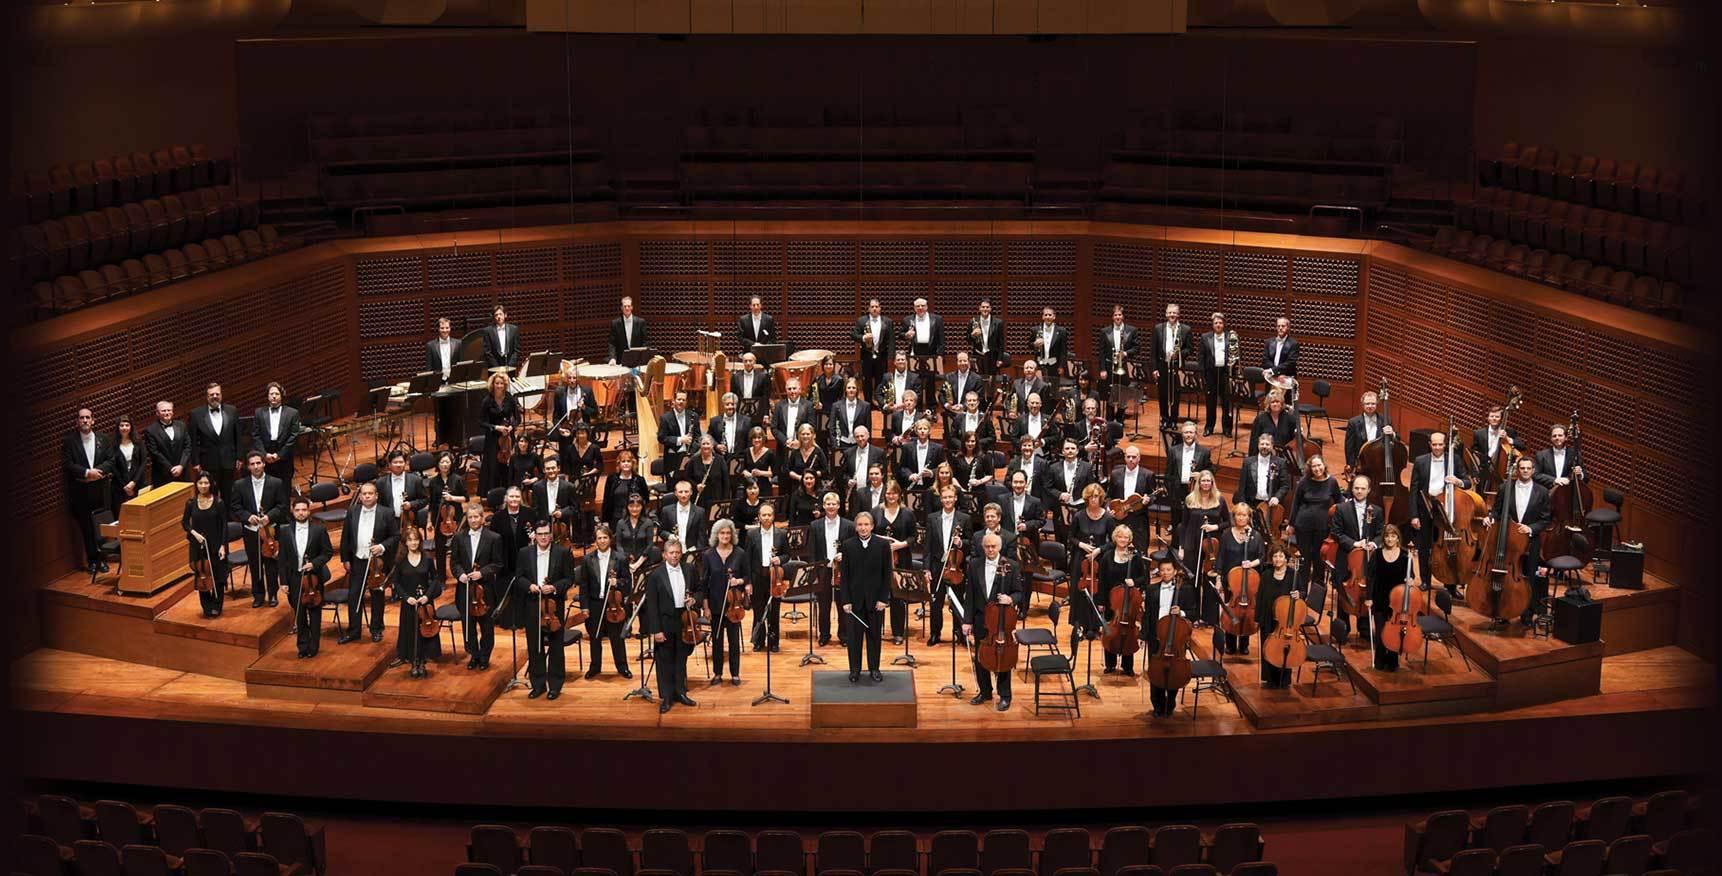 san francisco symphony サンフランシスコ交響楽団 warner music japan